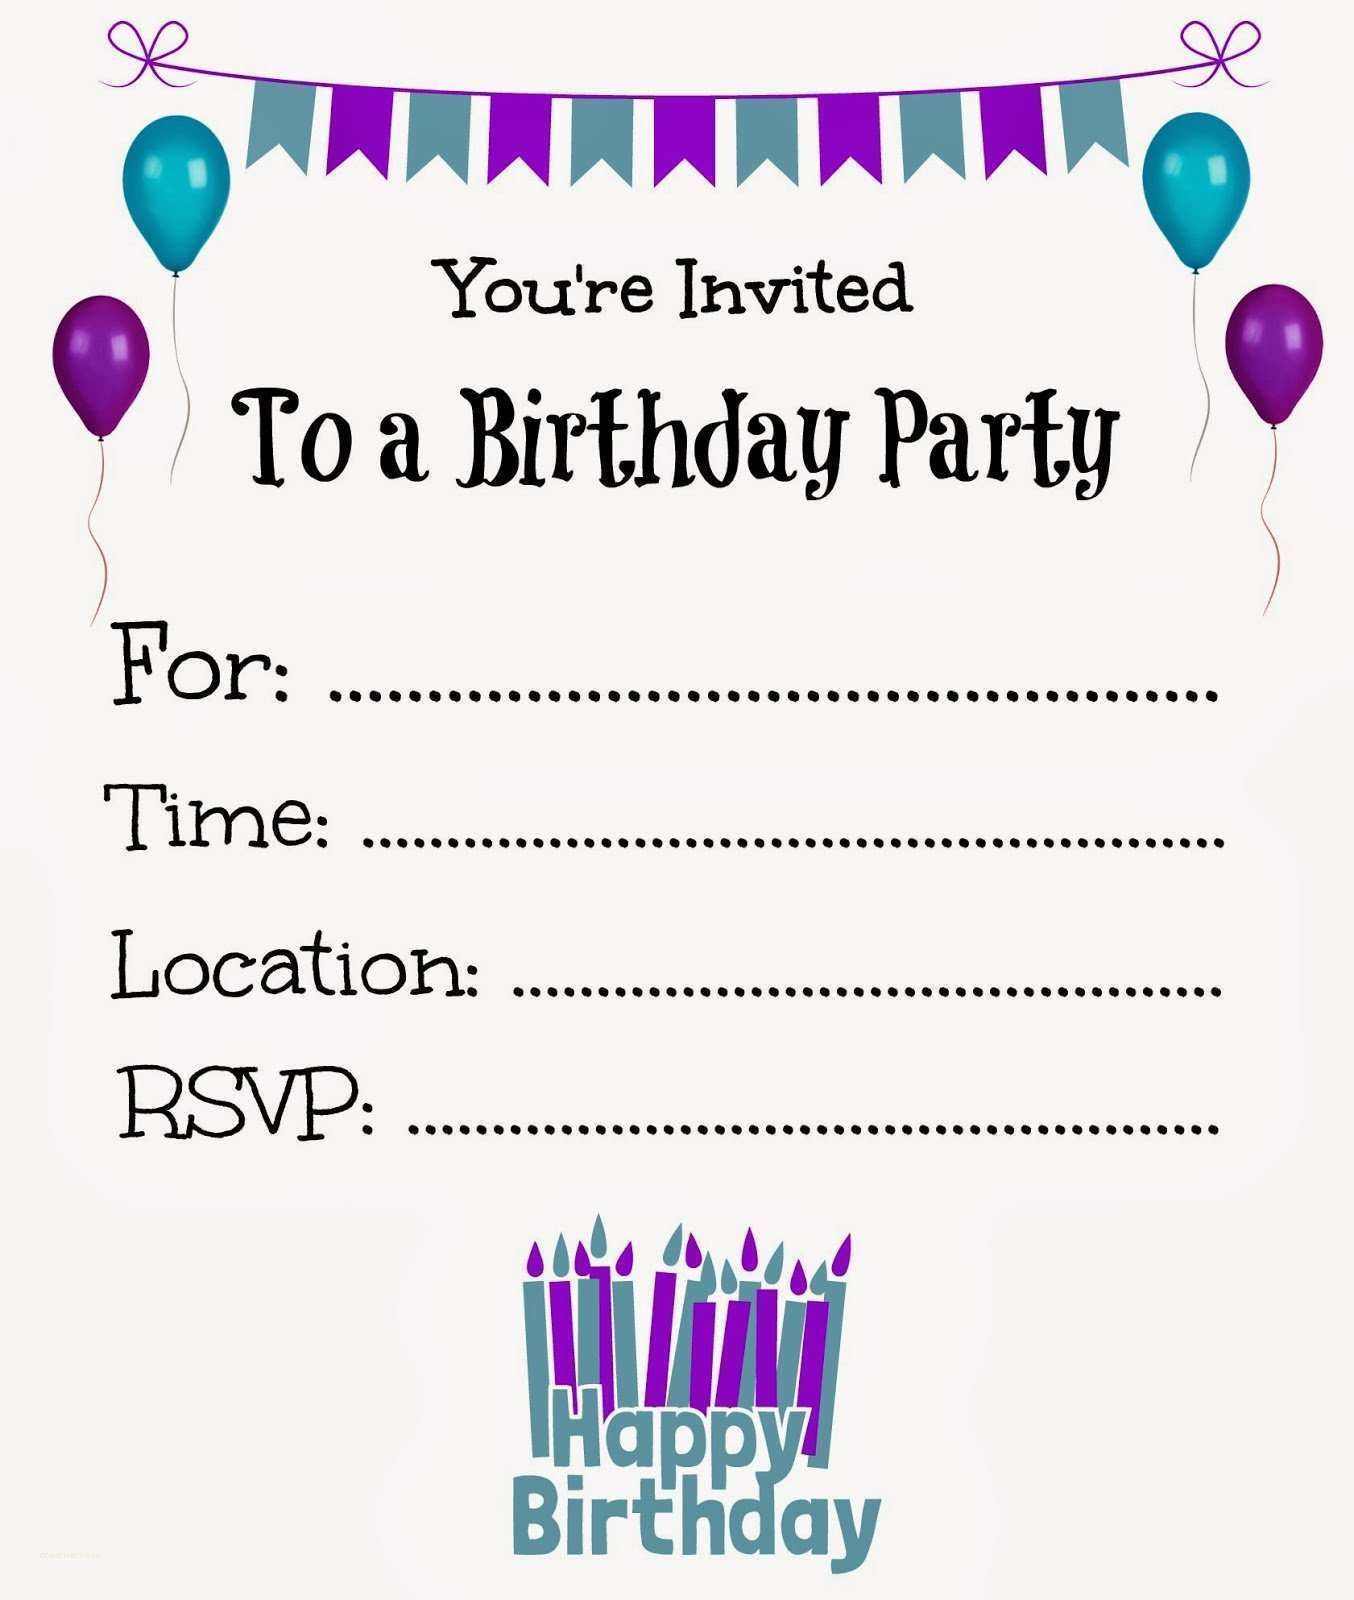 free printable birthday invitations templates  Birthday party